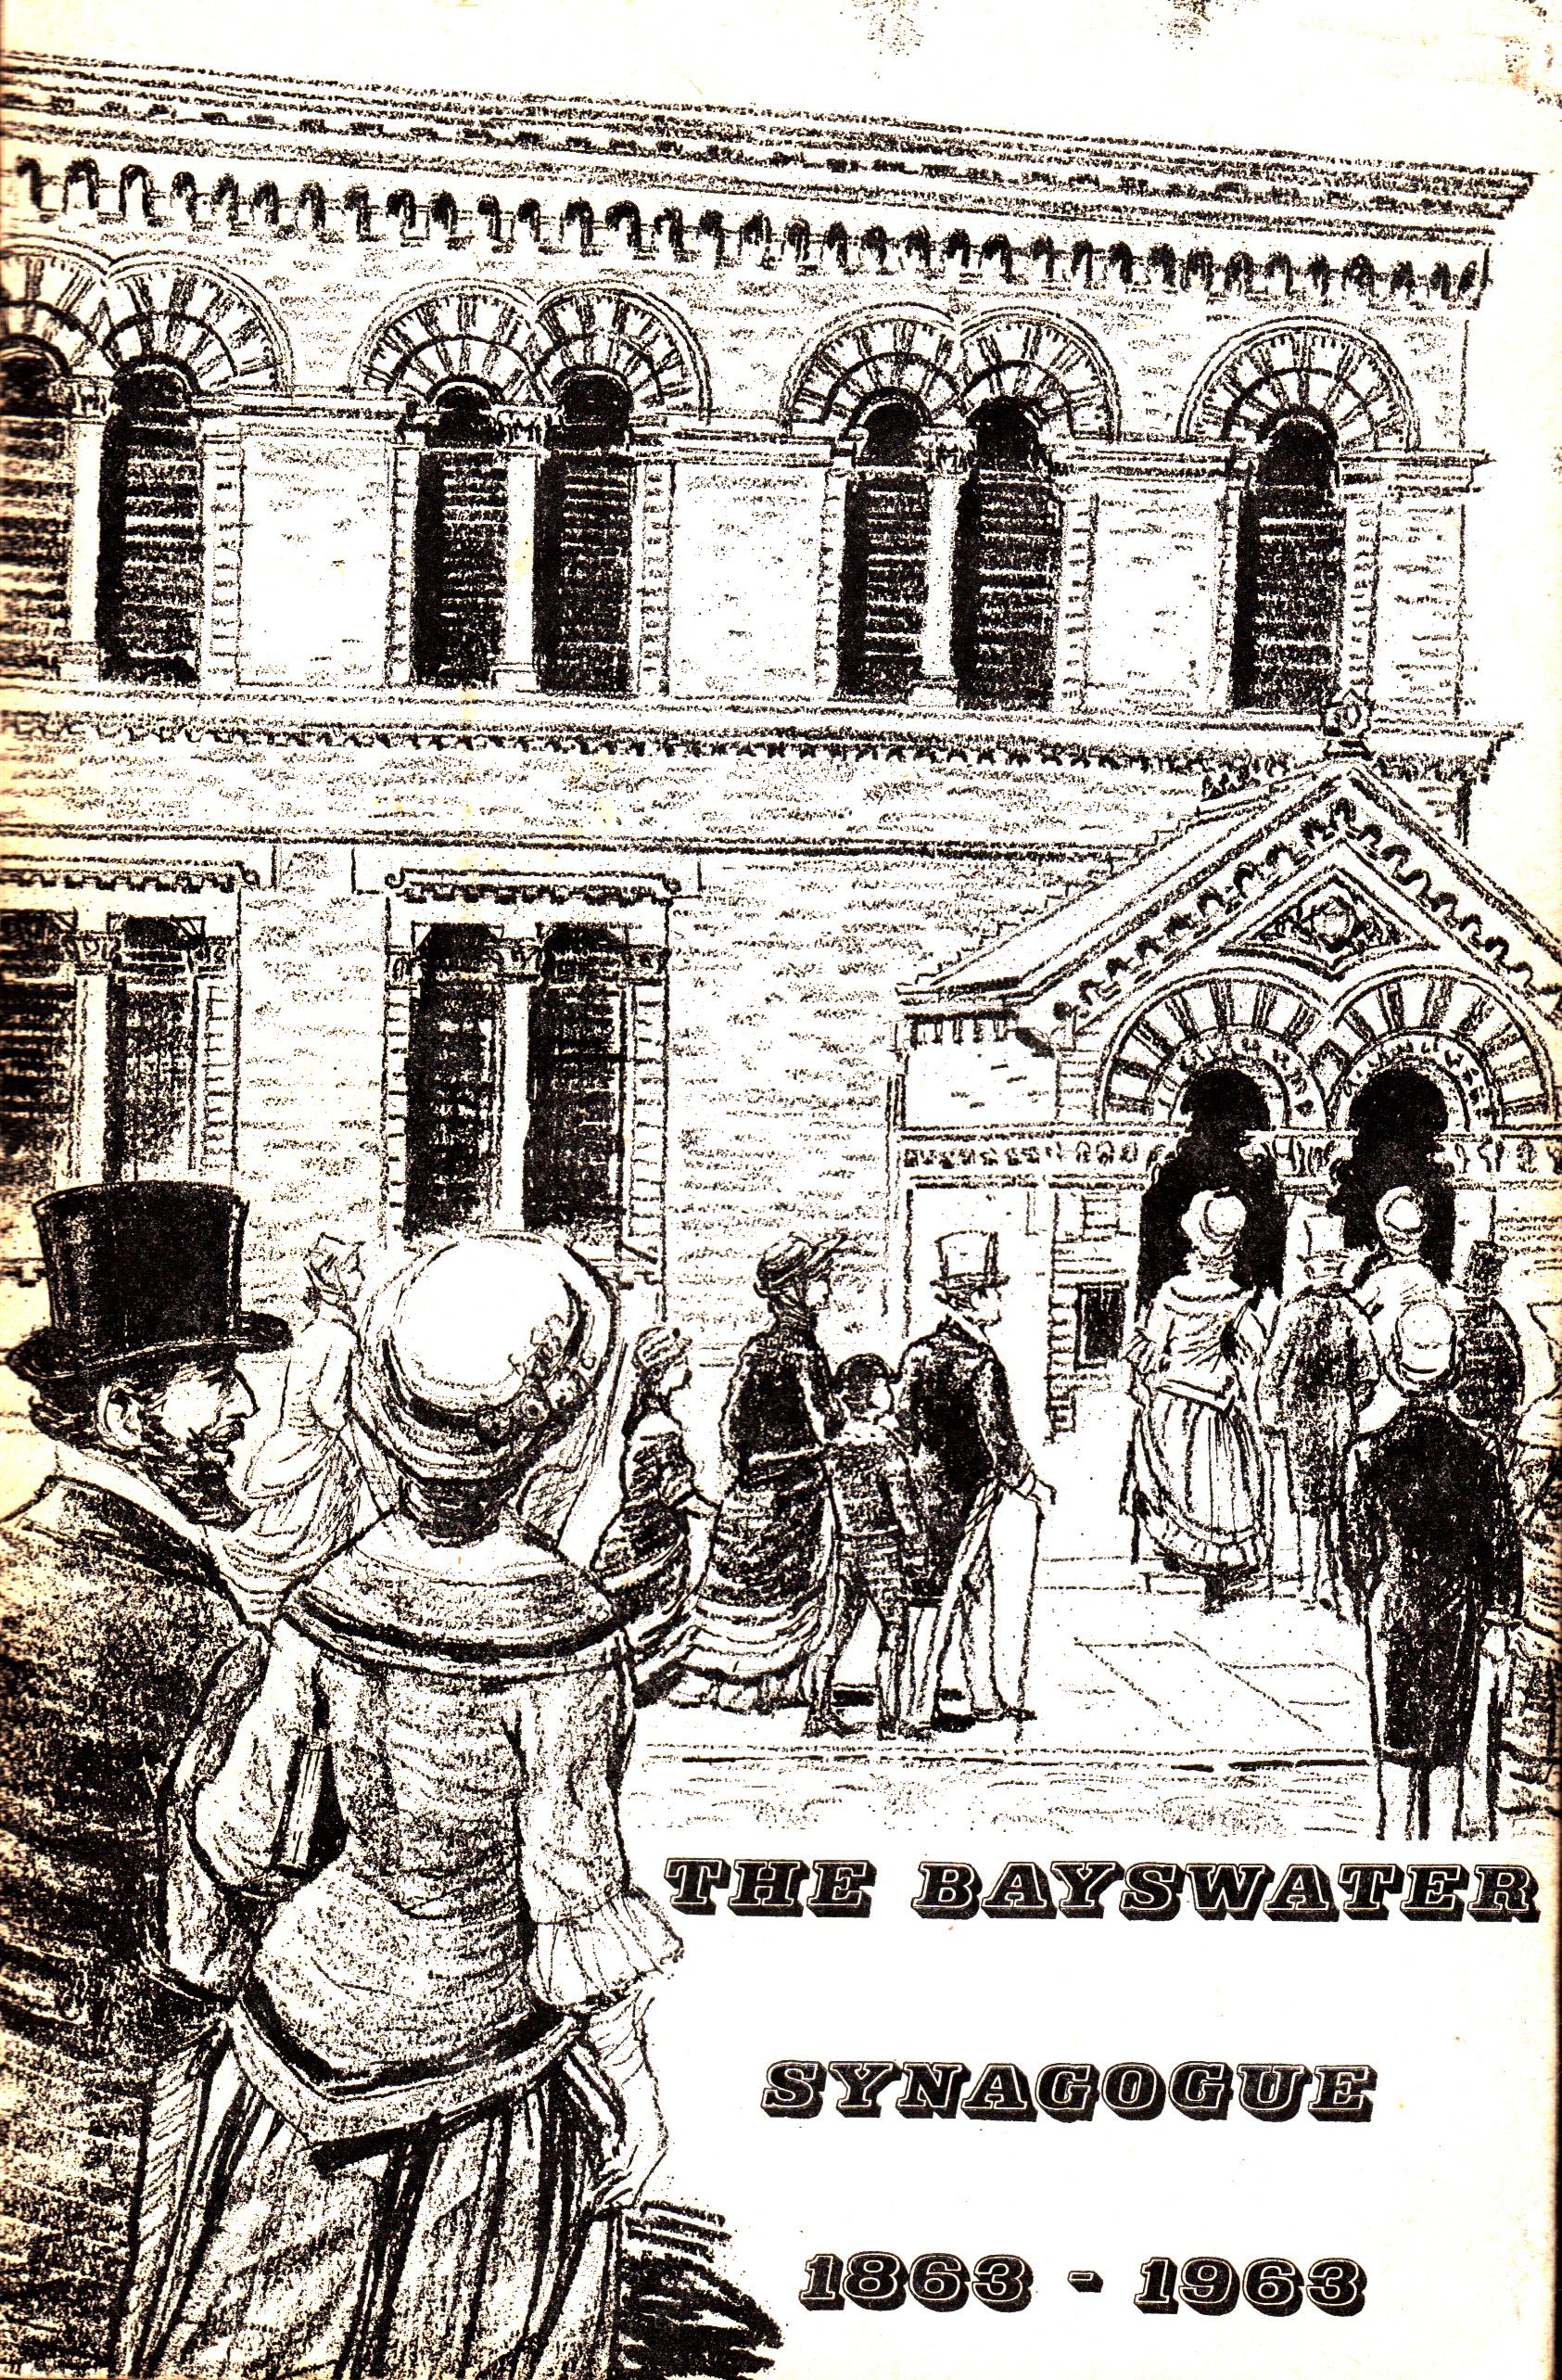 6g Bayswater_0001